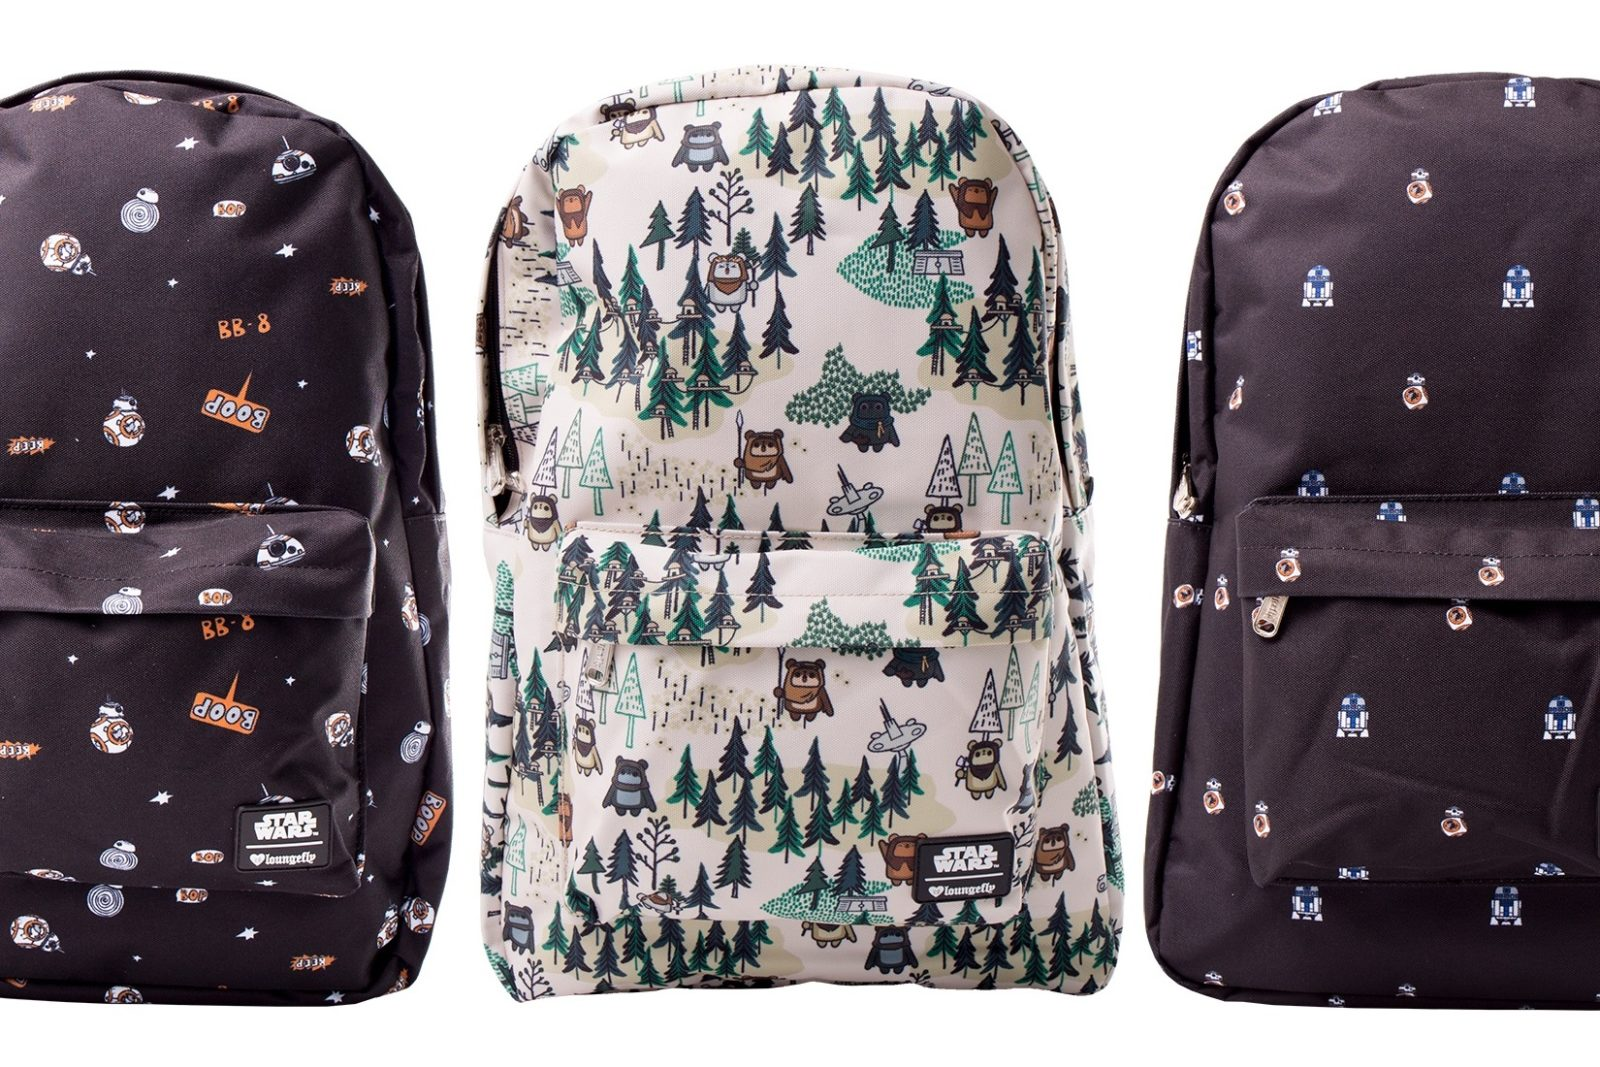 New Loungefly x Star Wars Backpacks